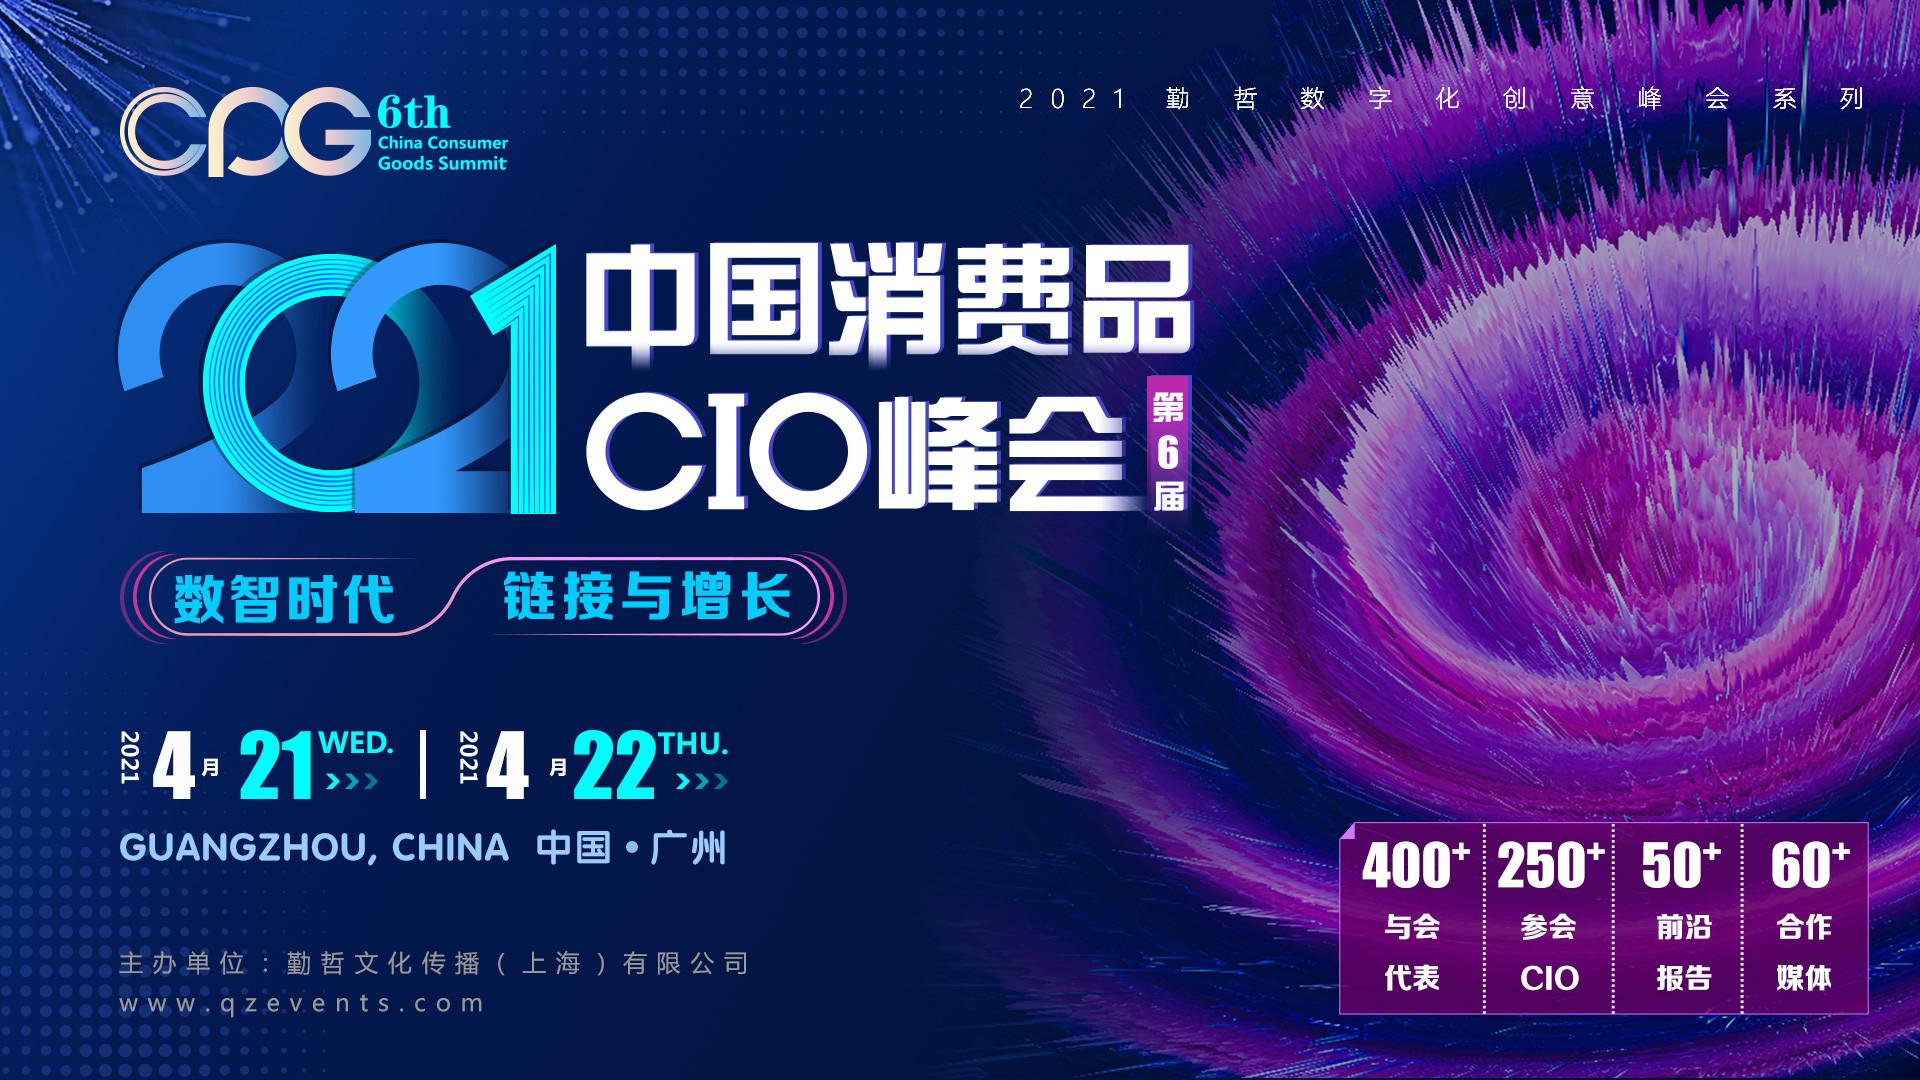 CPG 2021第六屆中國消費品CIO峰會